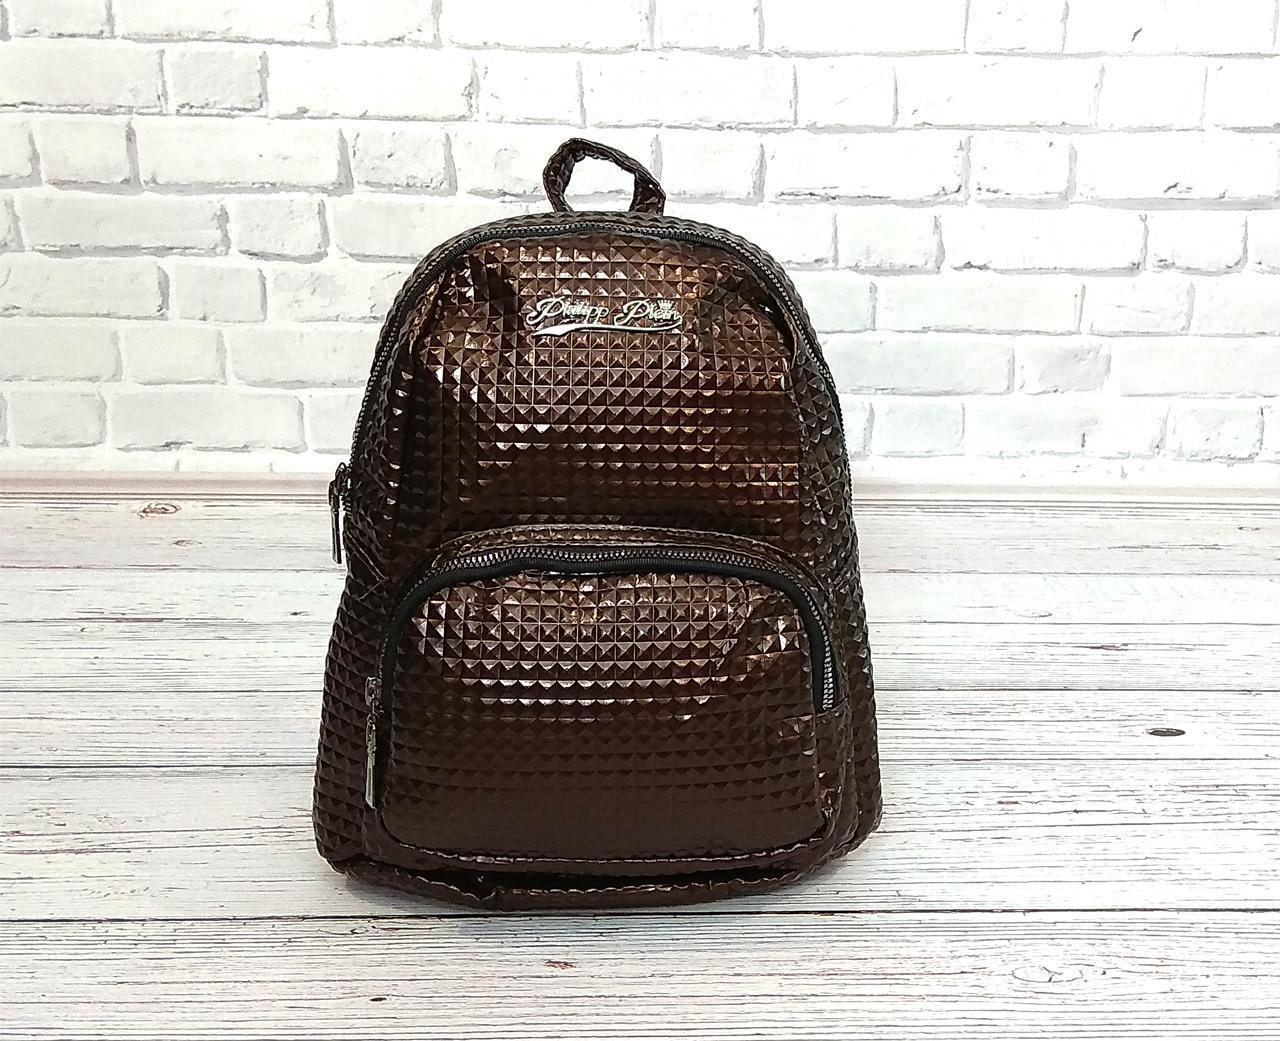 8a33a4a25aa5 Женский рюкзак в стиле Philipp Plein коричневый - PoliMAG в Киеве